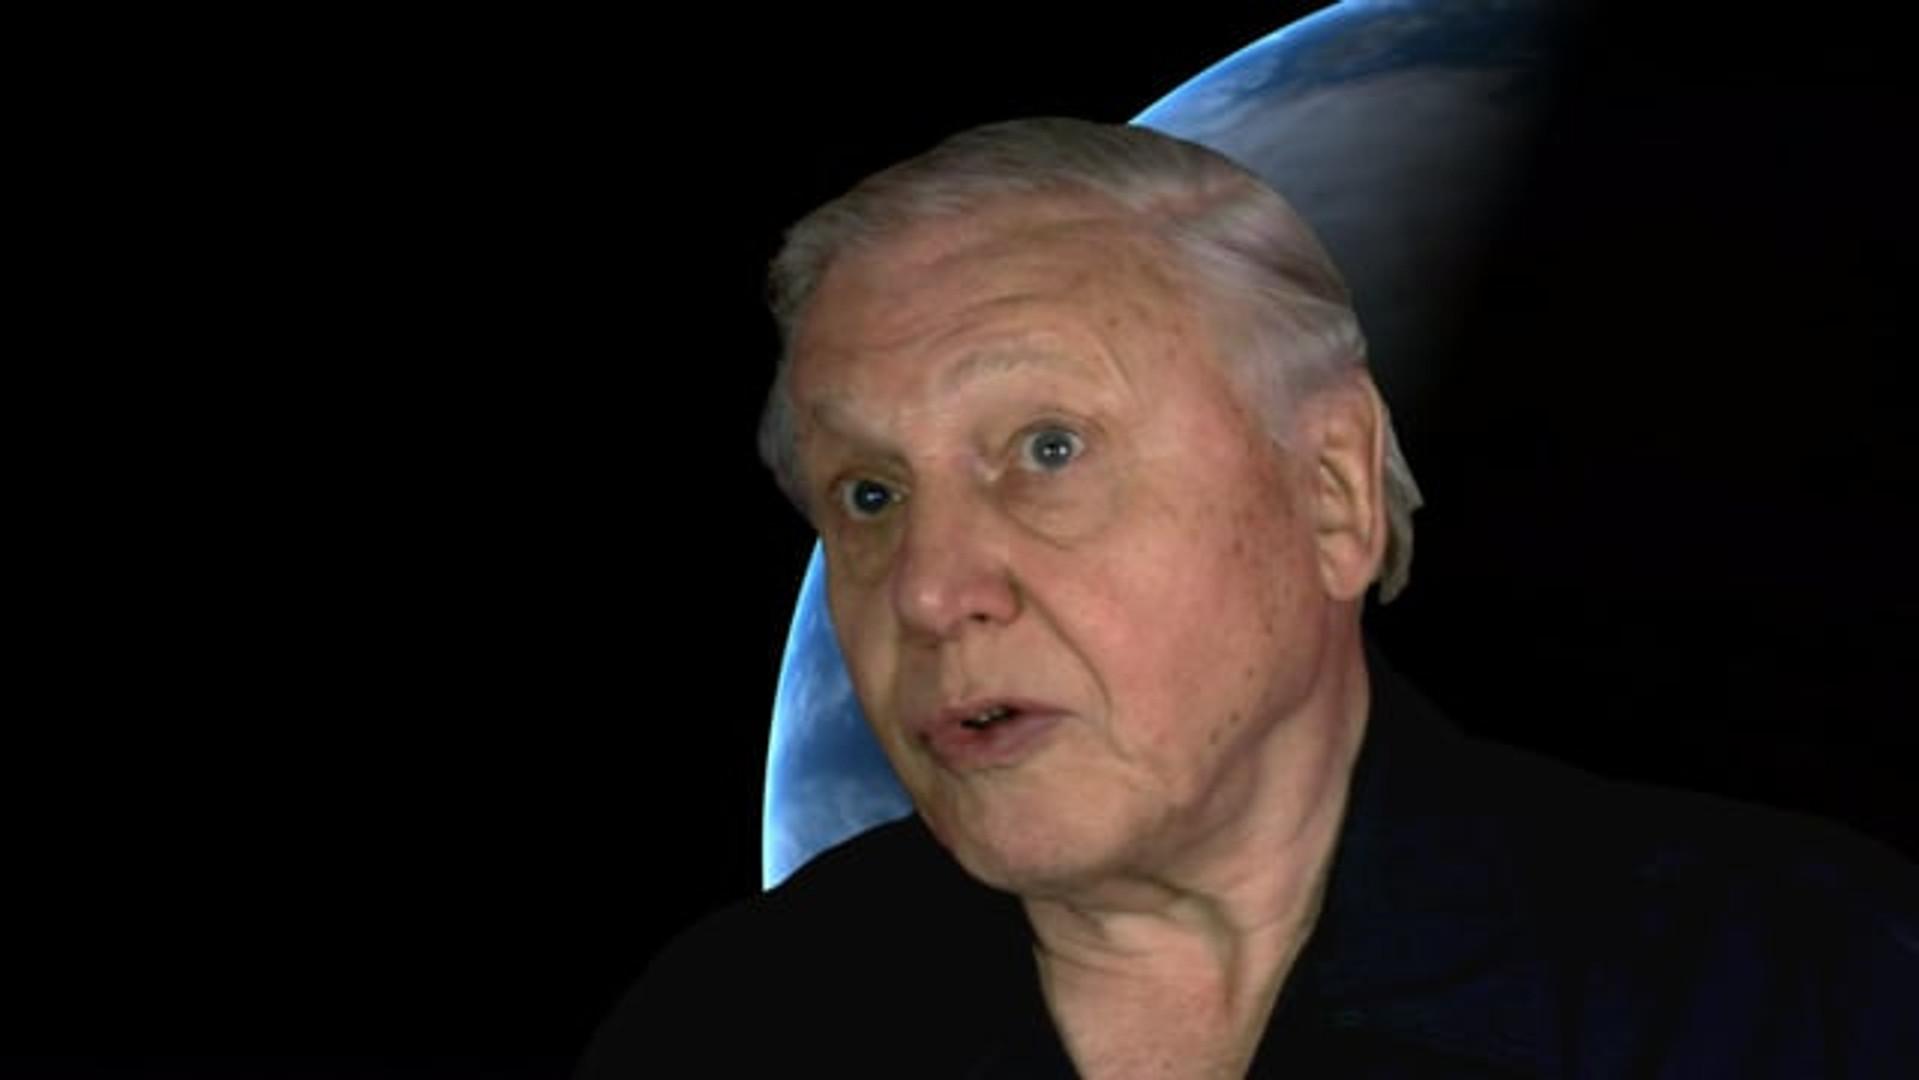 Interview with David Attenborough